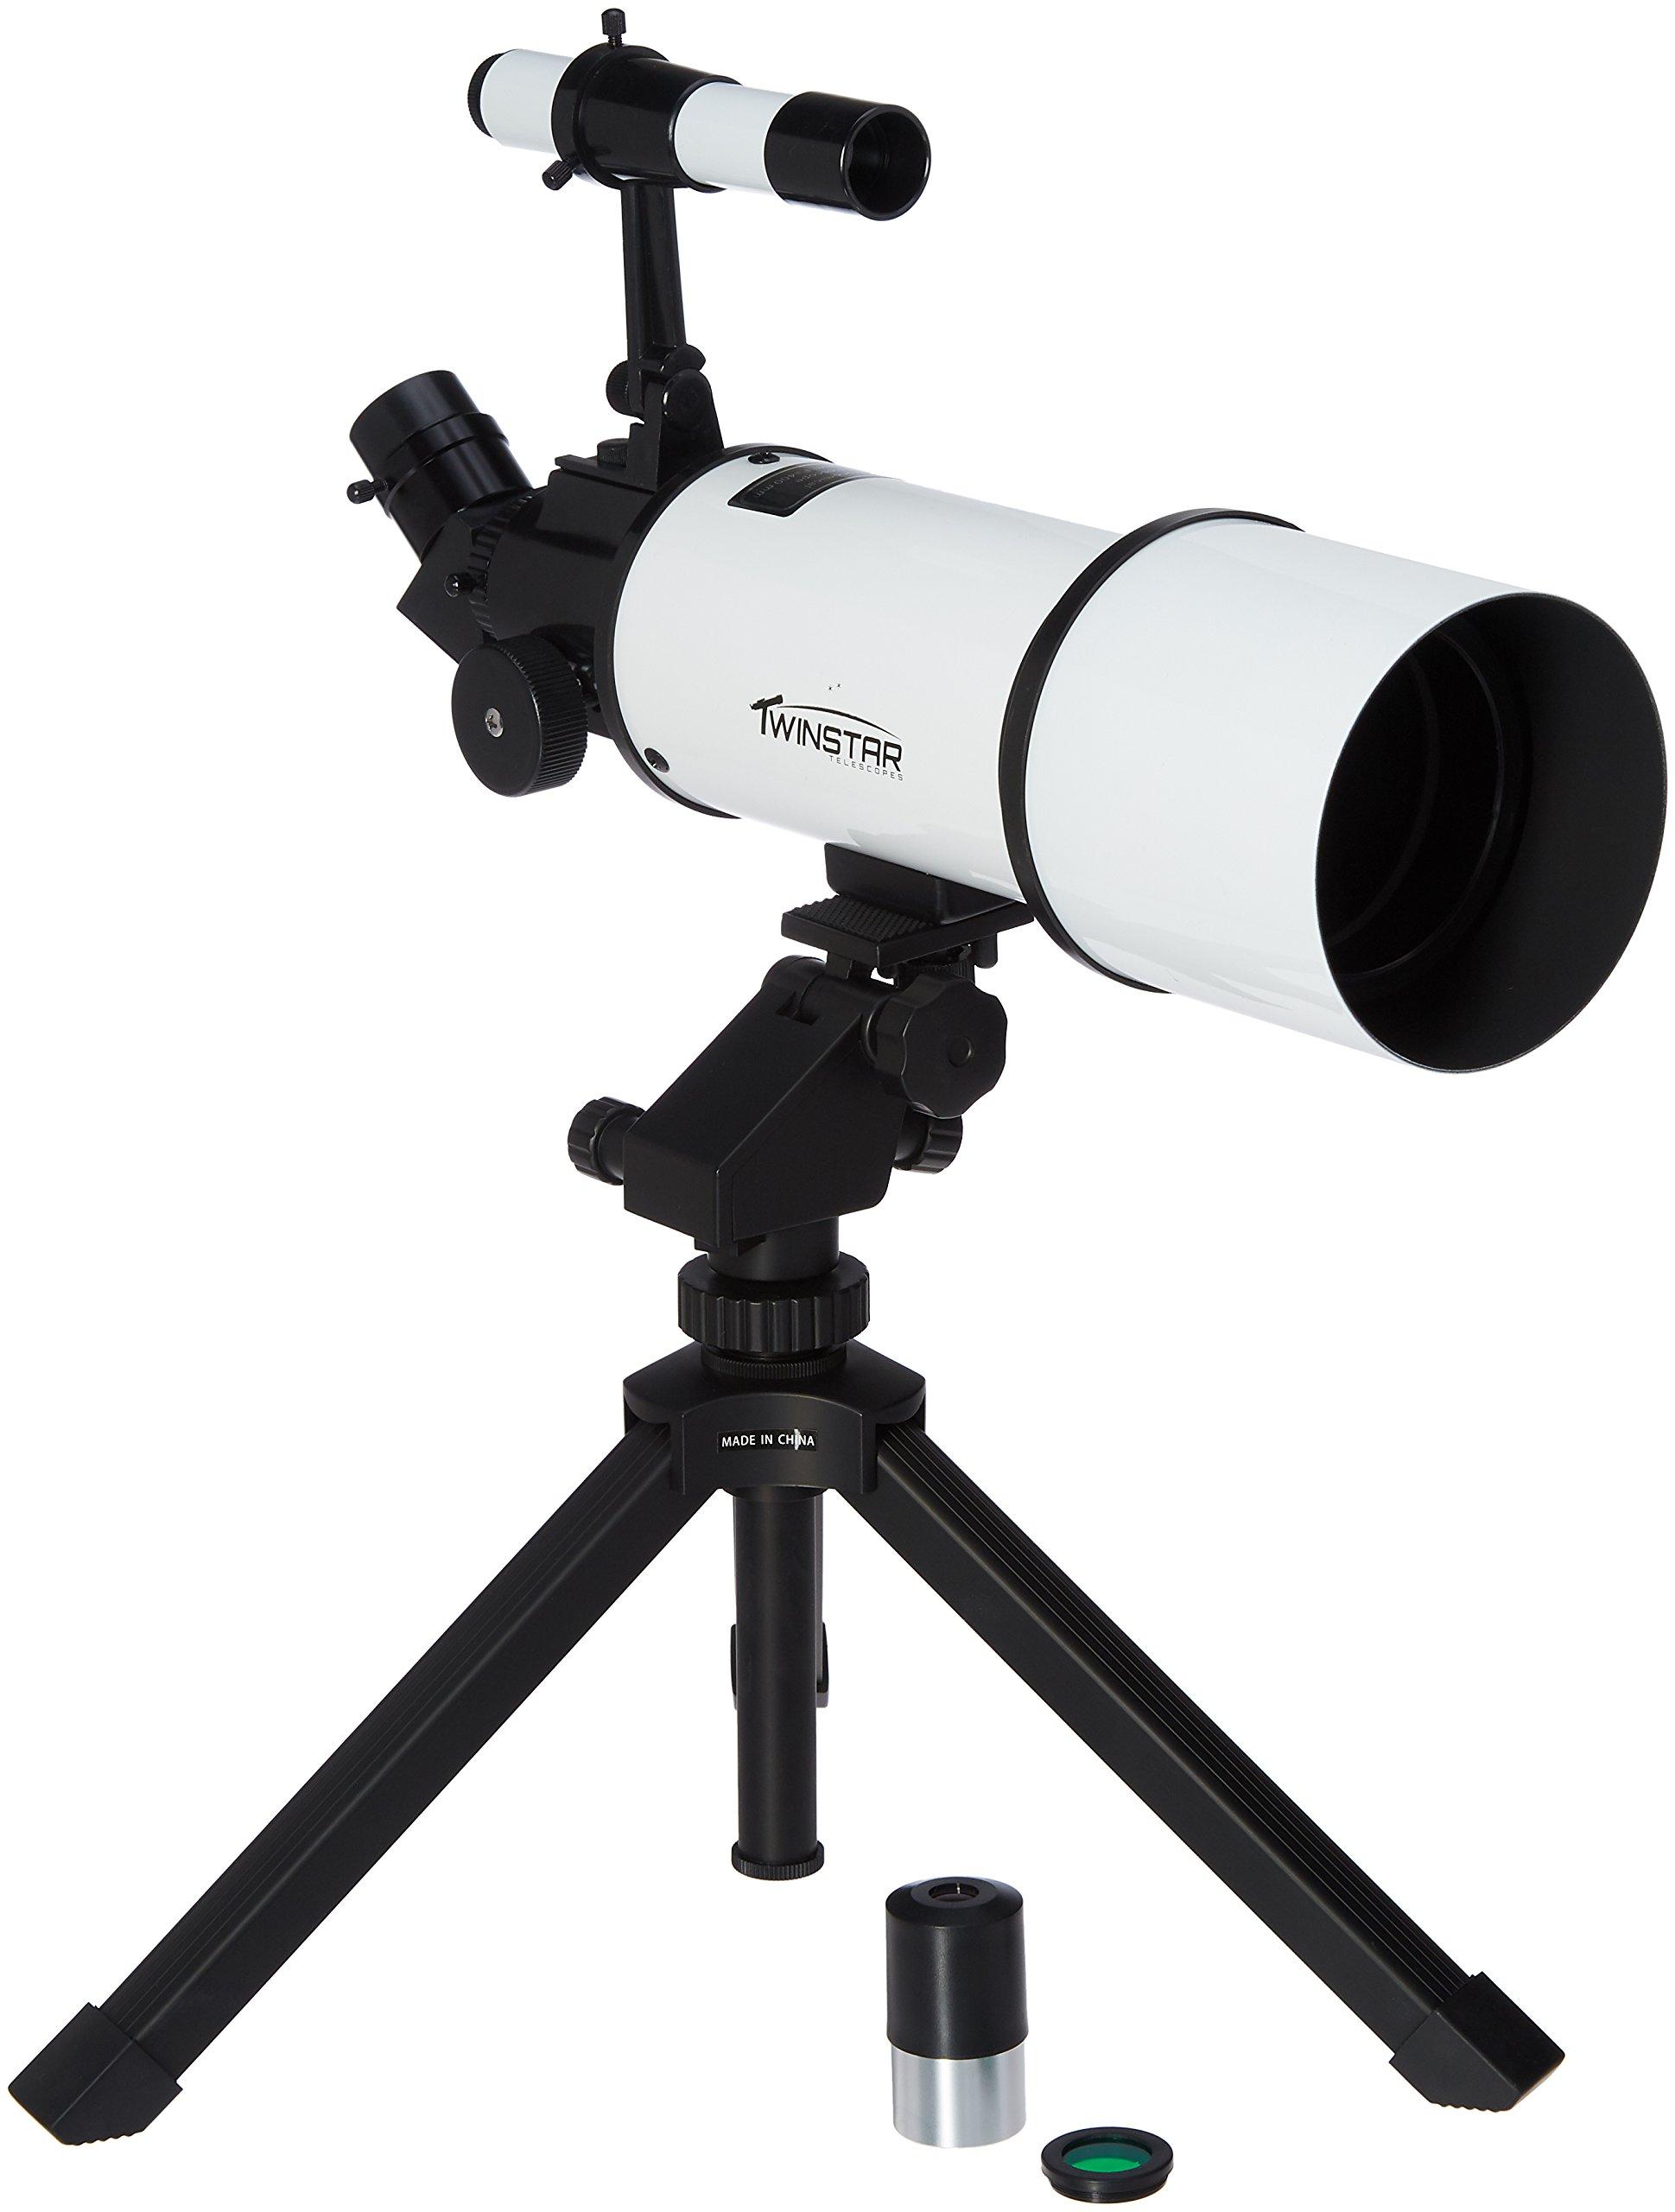 Silver TwinStar AstroMark 80mm 16-40x Power Portable Refractor Telescope